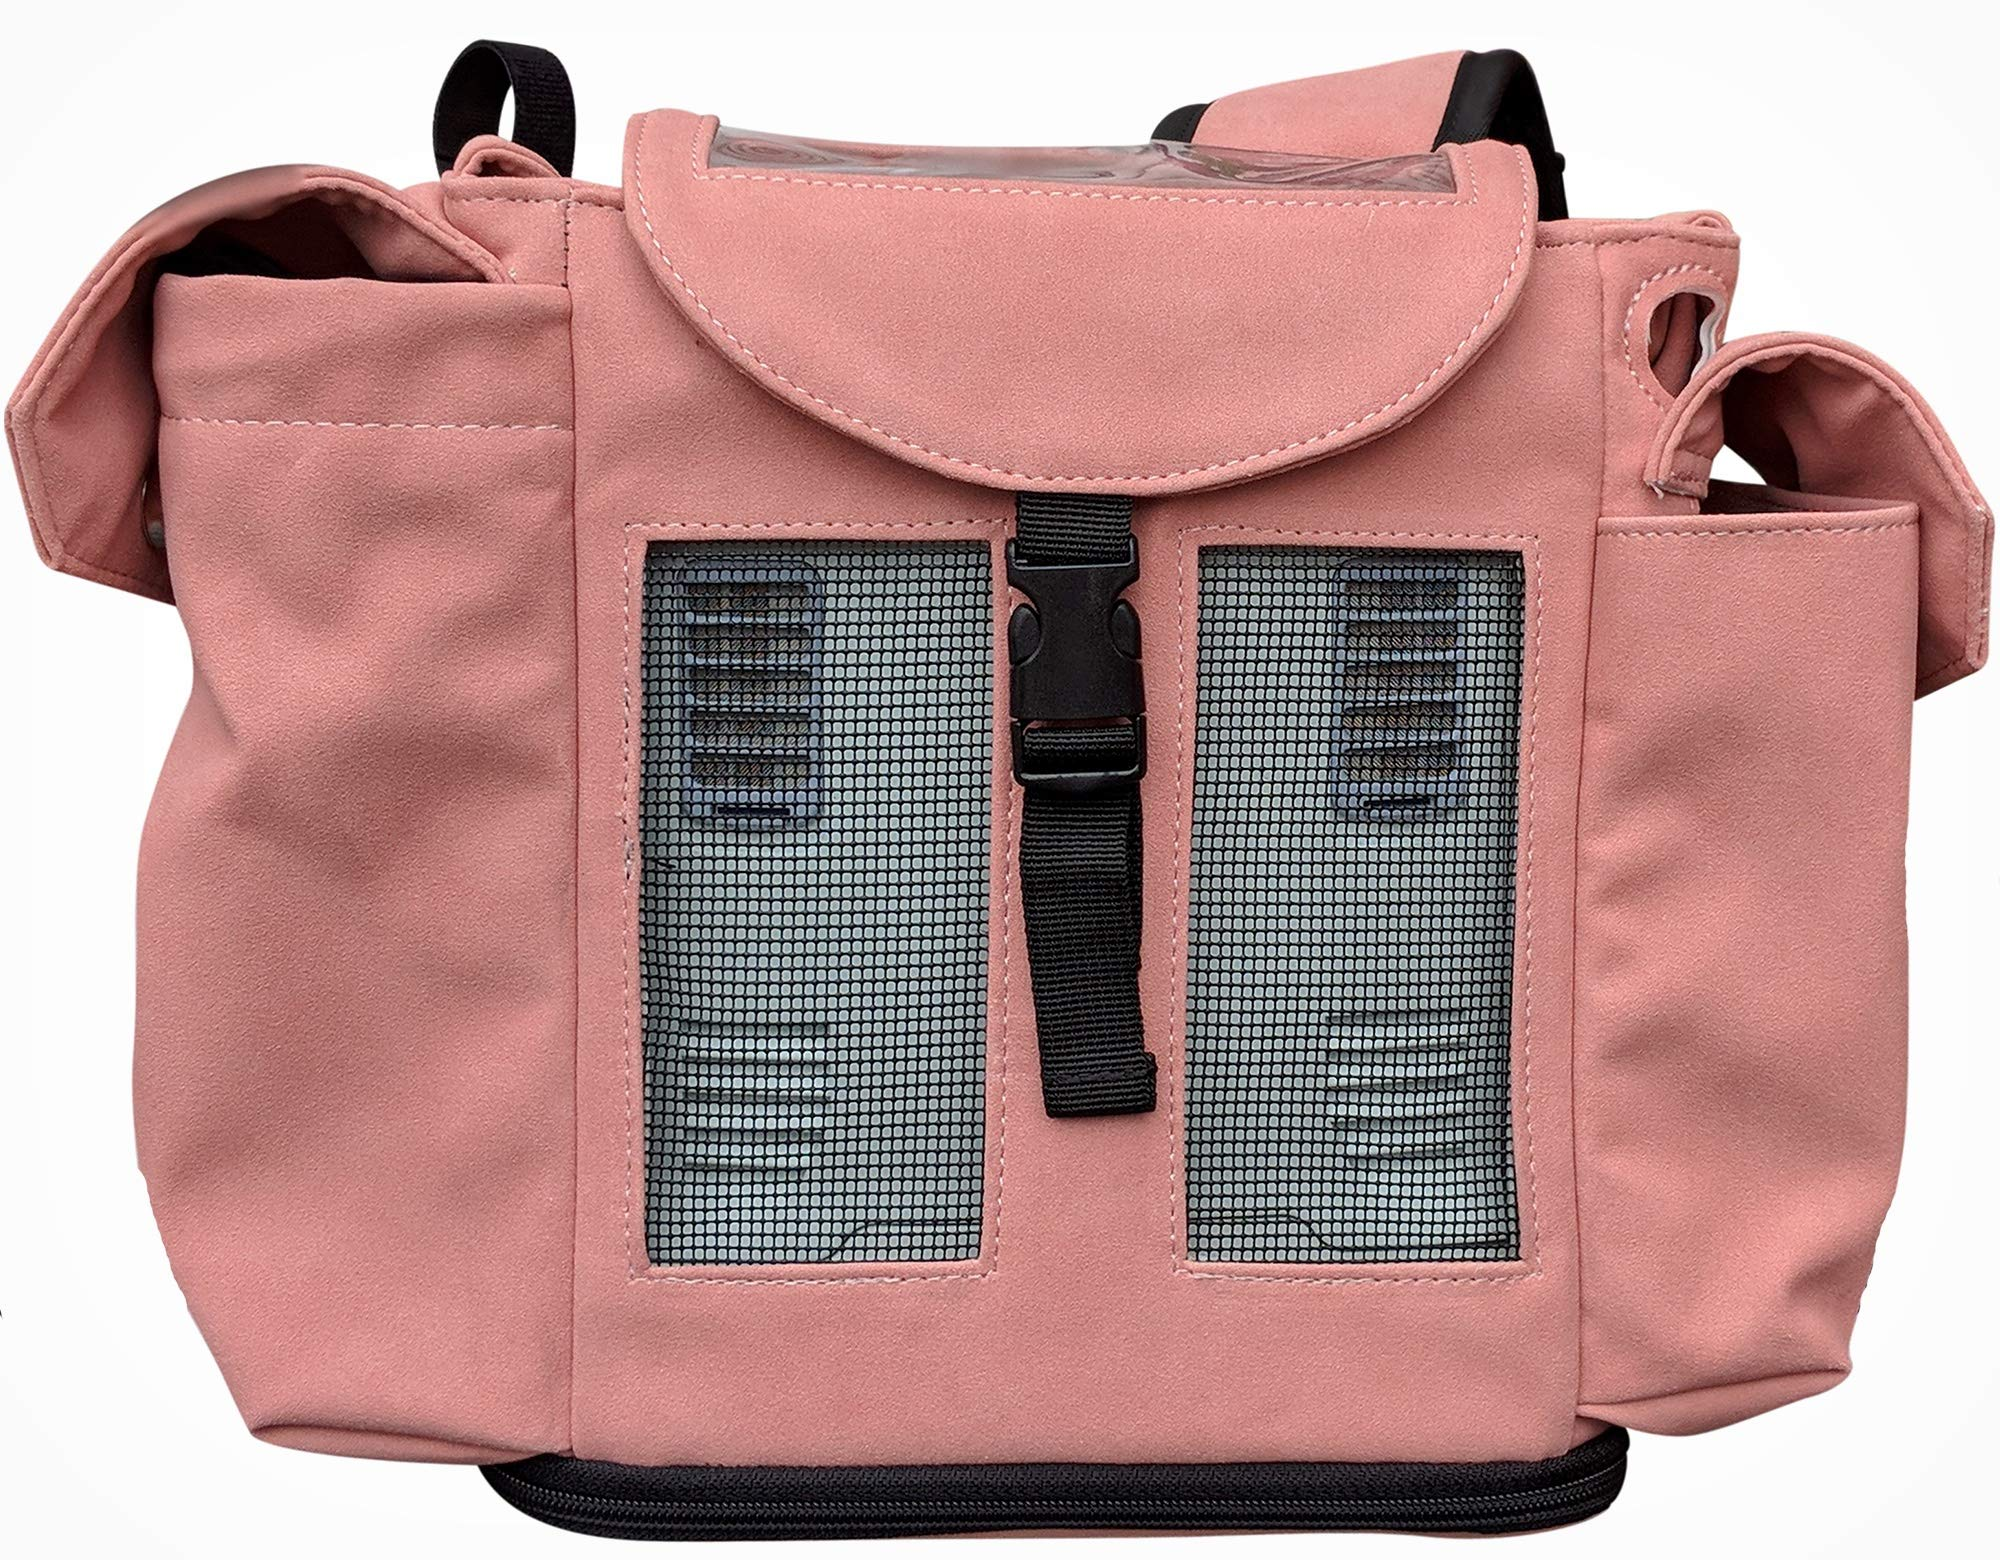 Oxygo & Inogen one G3 Backpack/Lightweight, Room for Charging Cords, Wallet, Keys